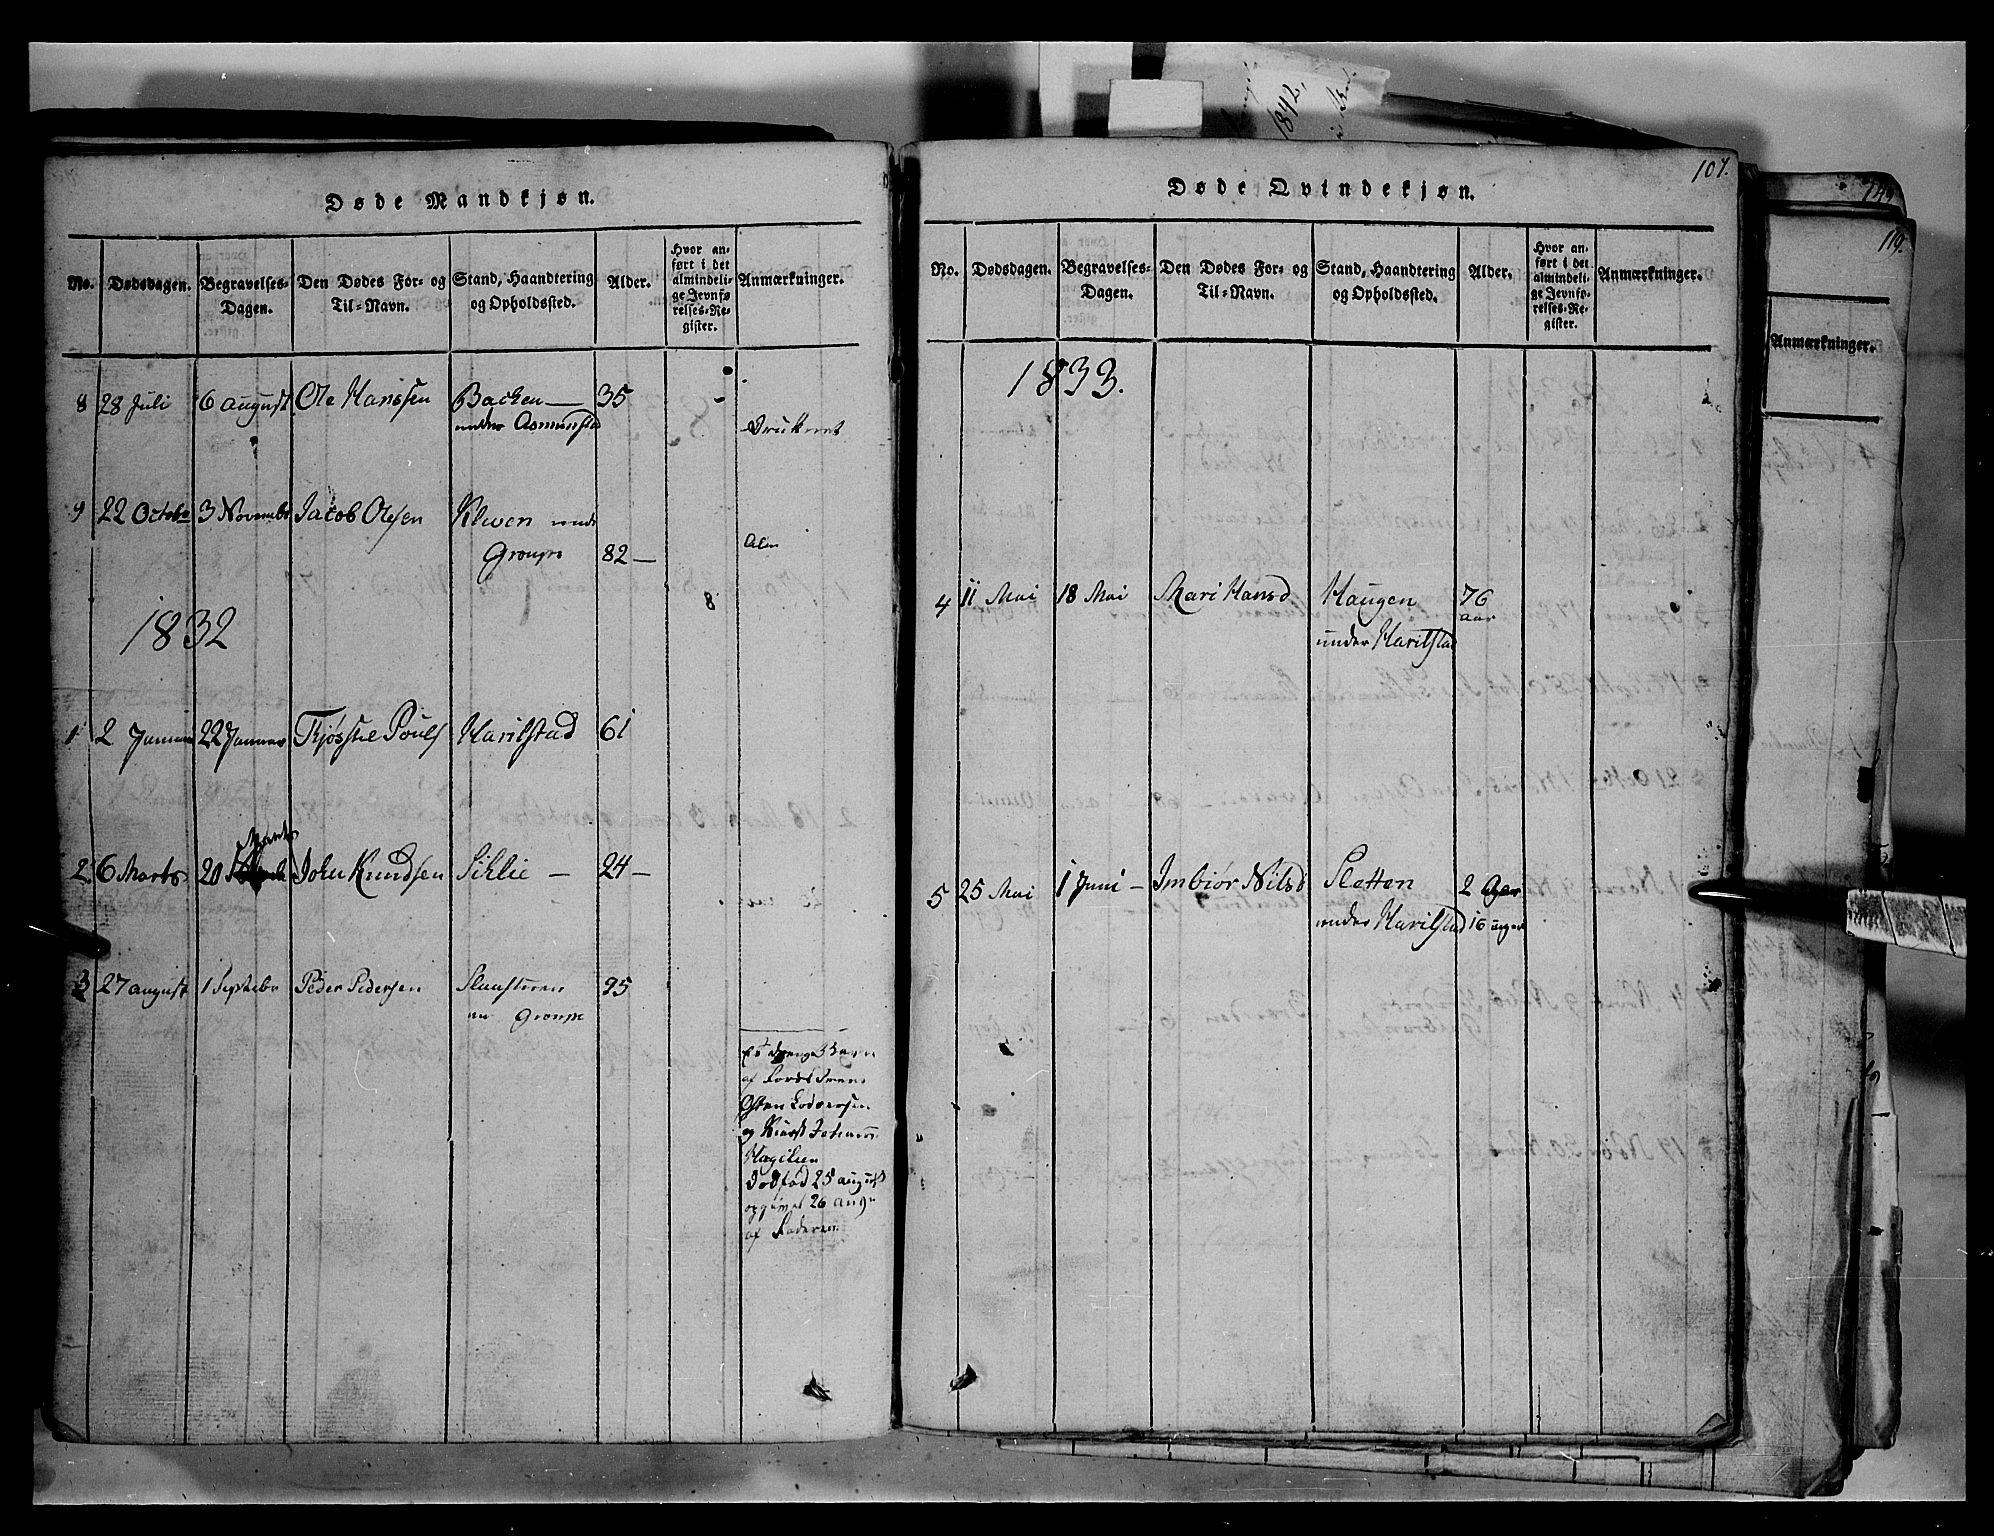 SAH, Fron prestekontor, H/Ha/Hab/L0003: Klokkerbok nr. 3, 1816-1850, s. 107